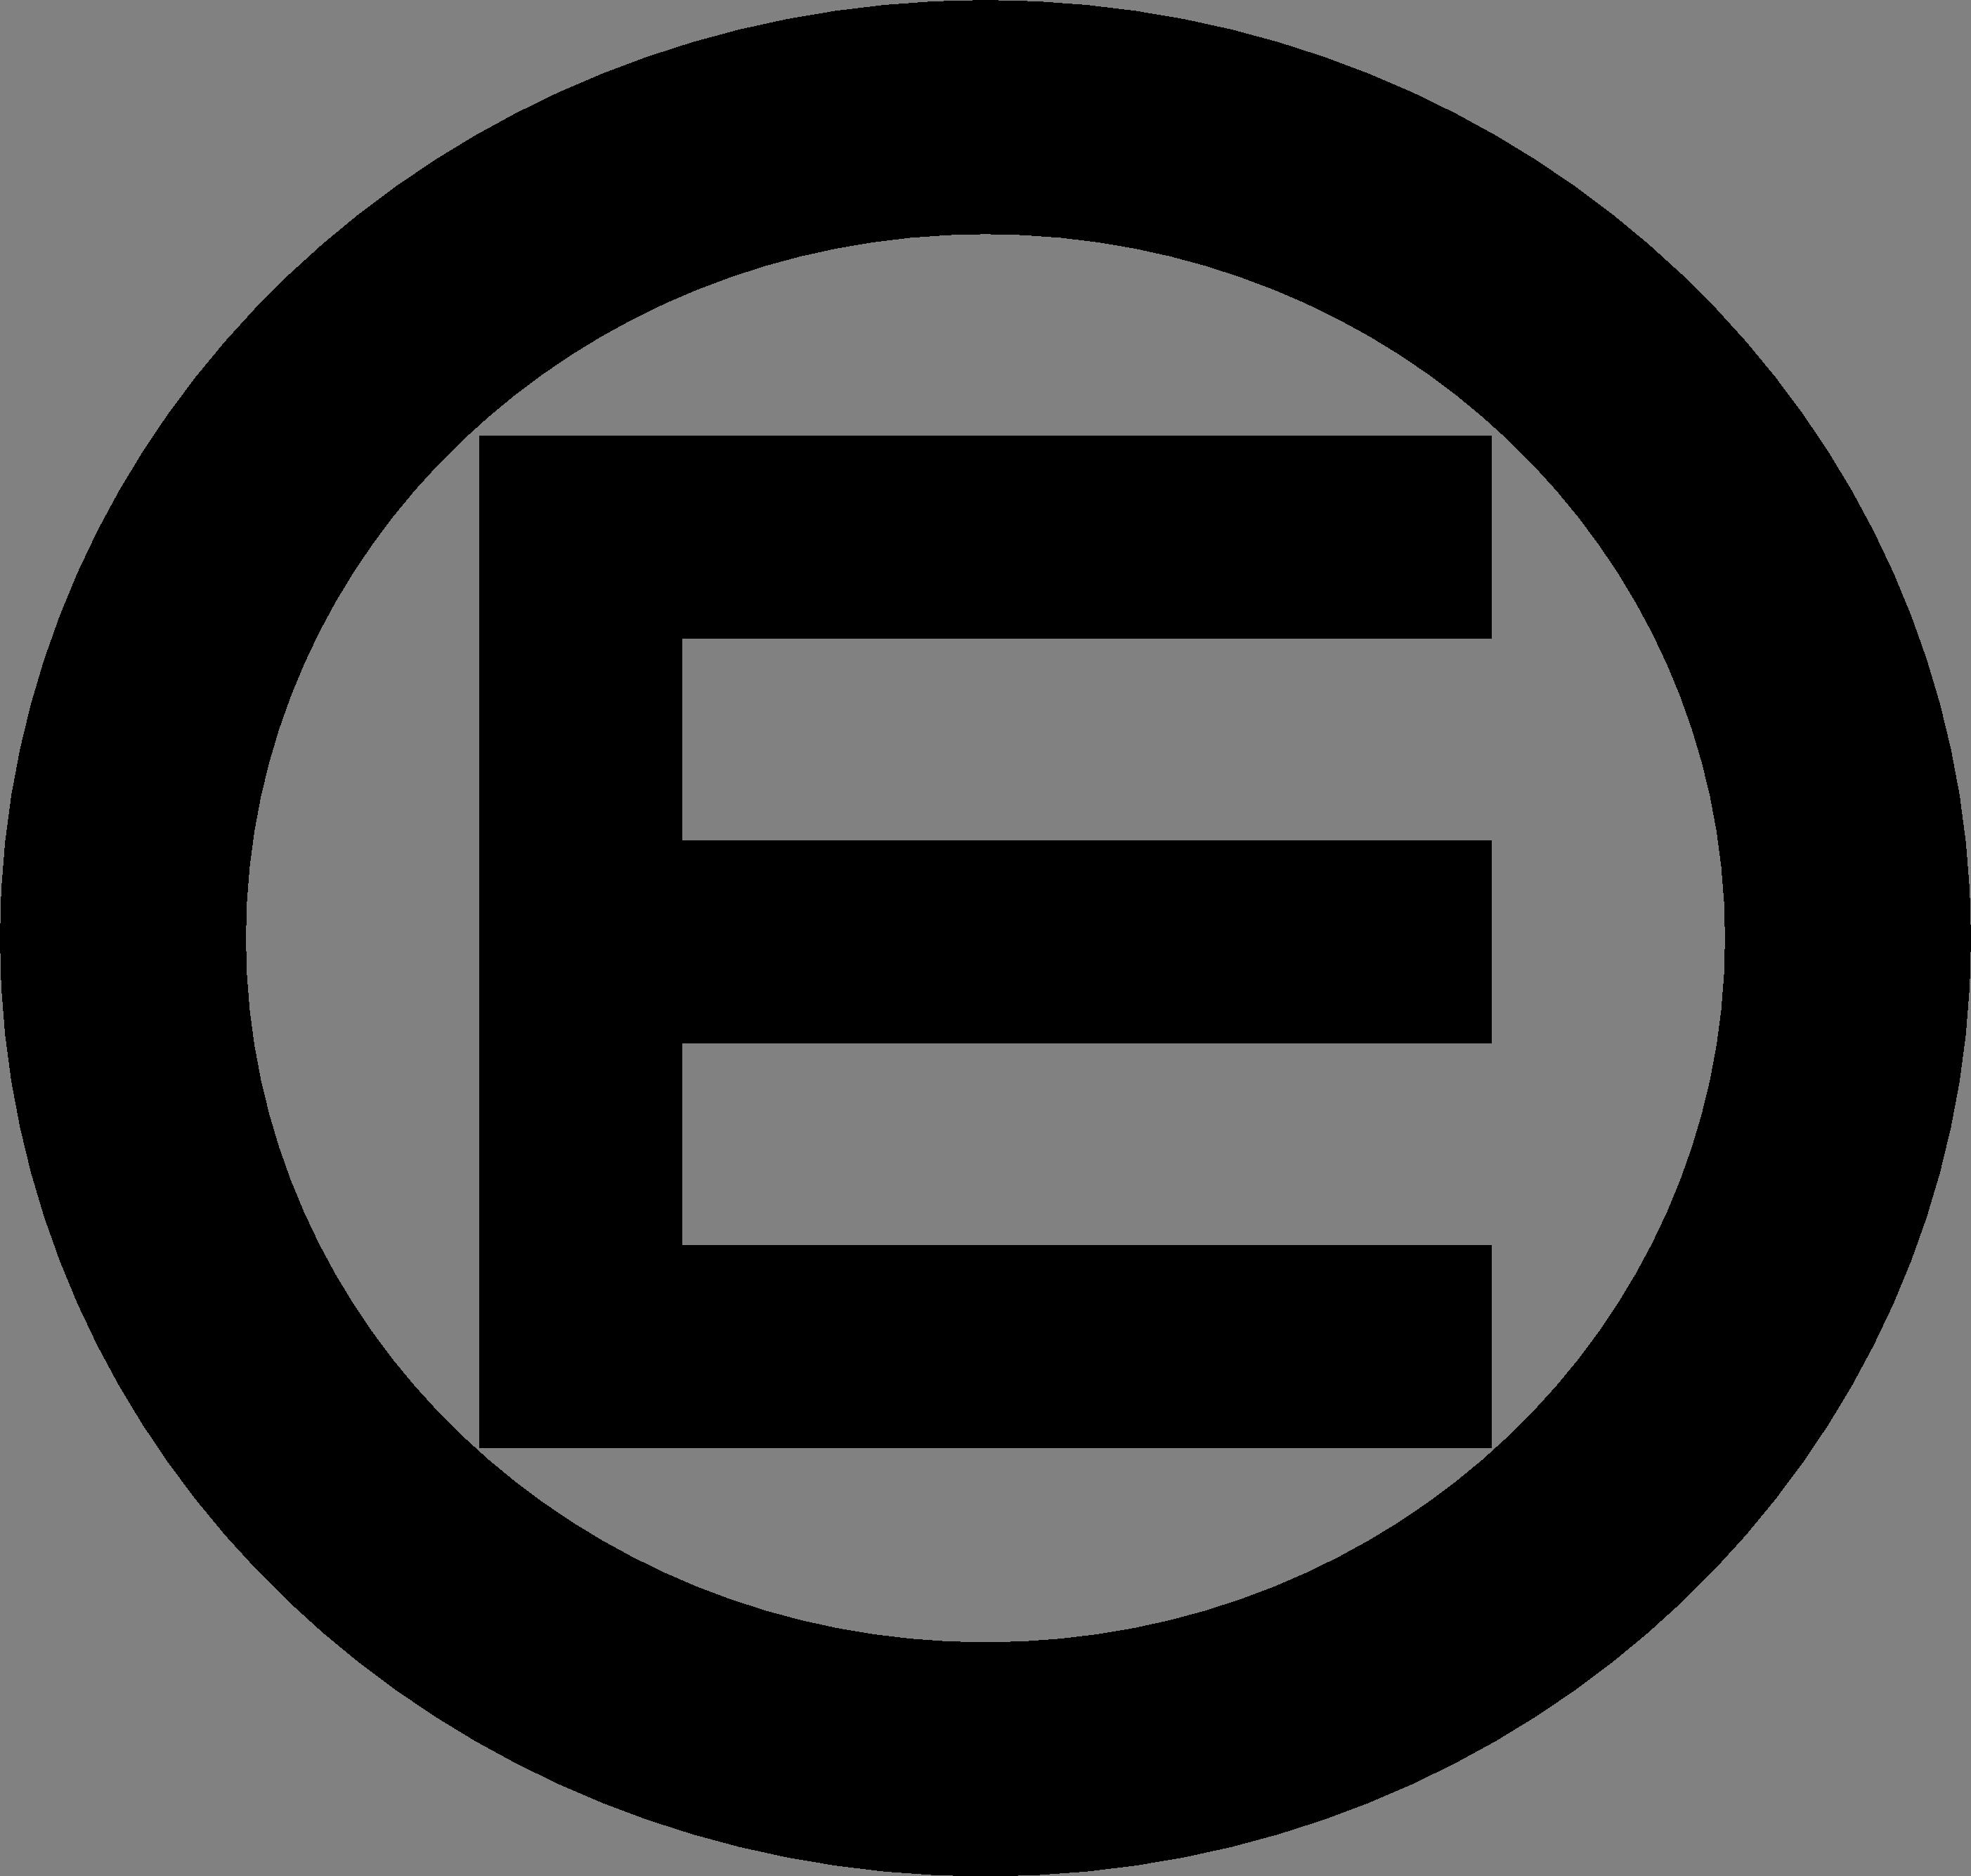 Alfa img - Showing > Social Equality Symbol